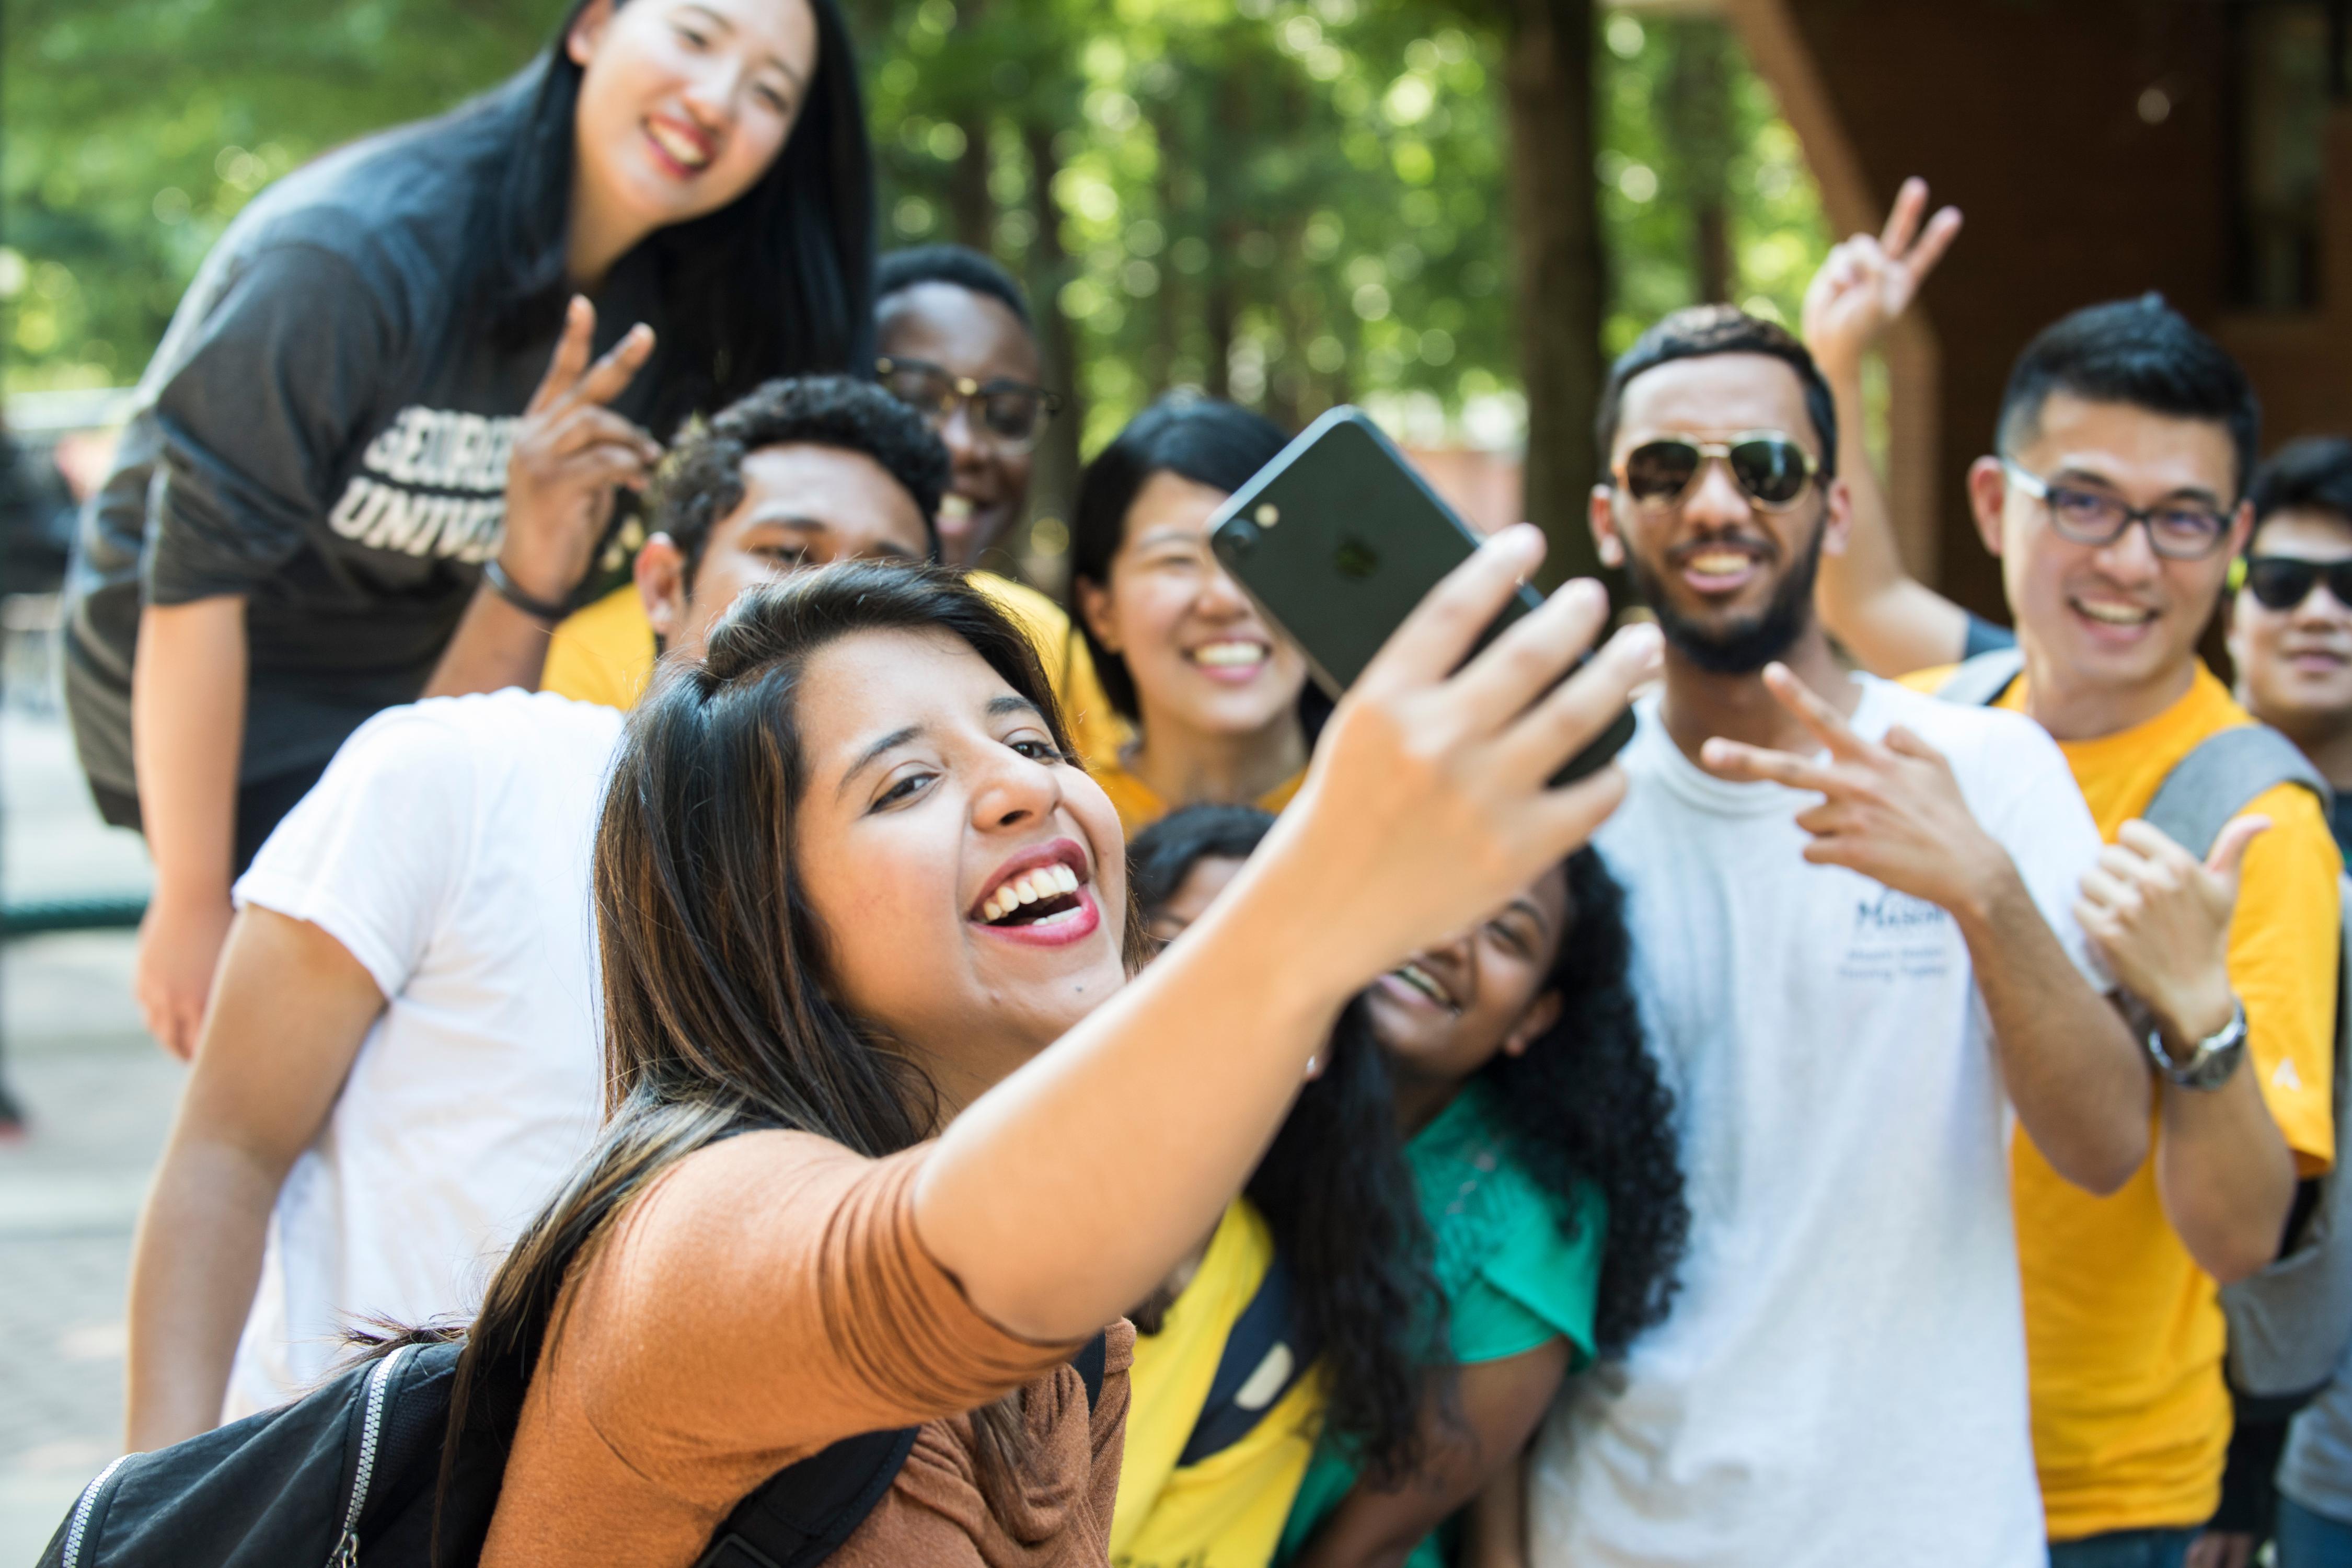 GMU Students taking group photo